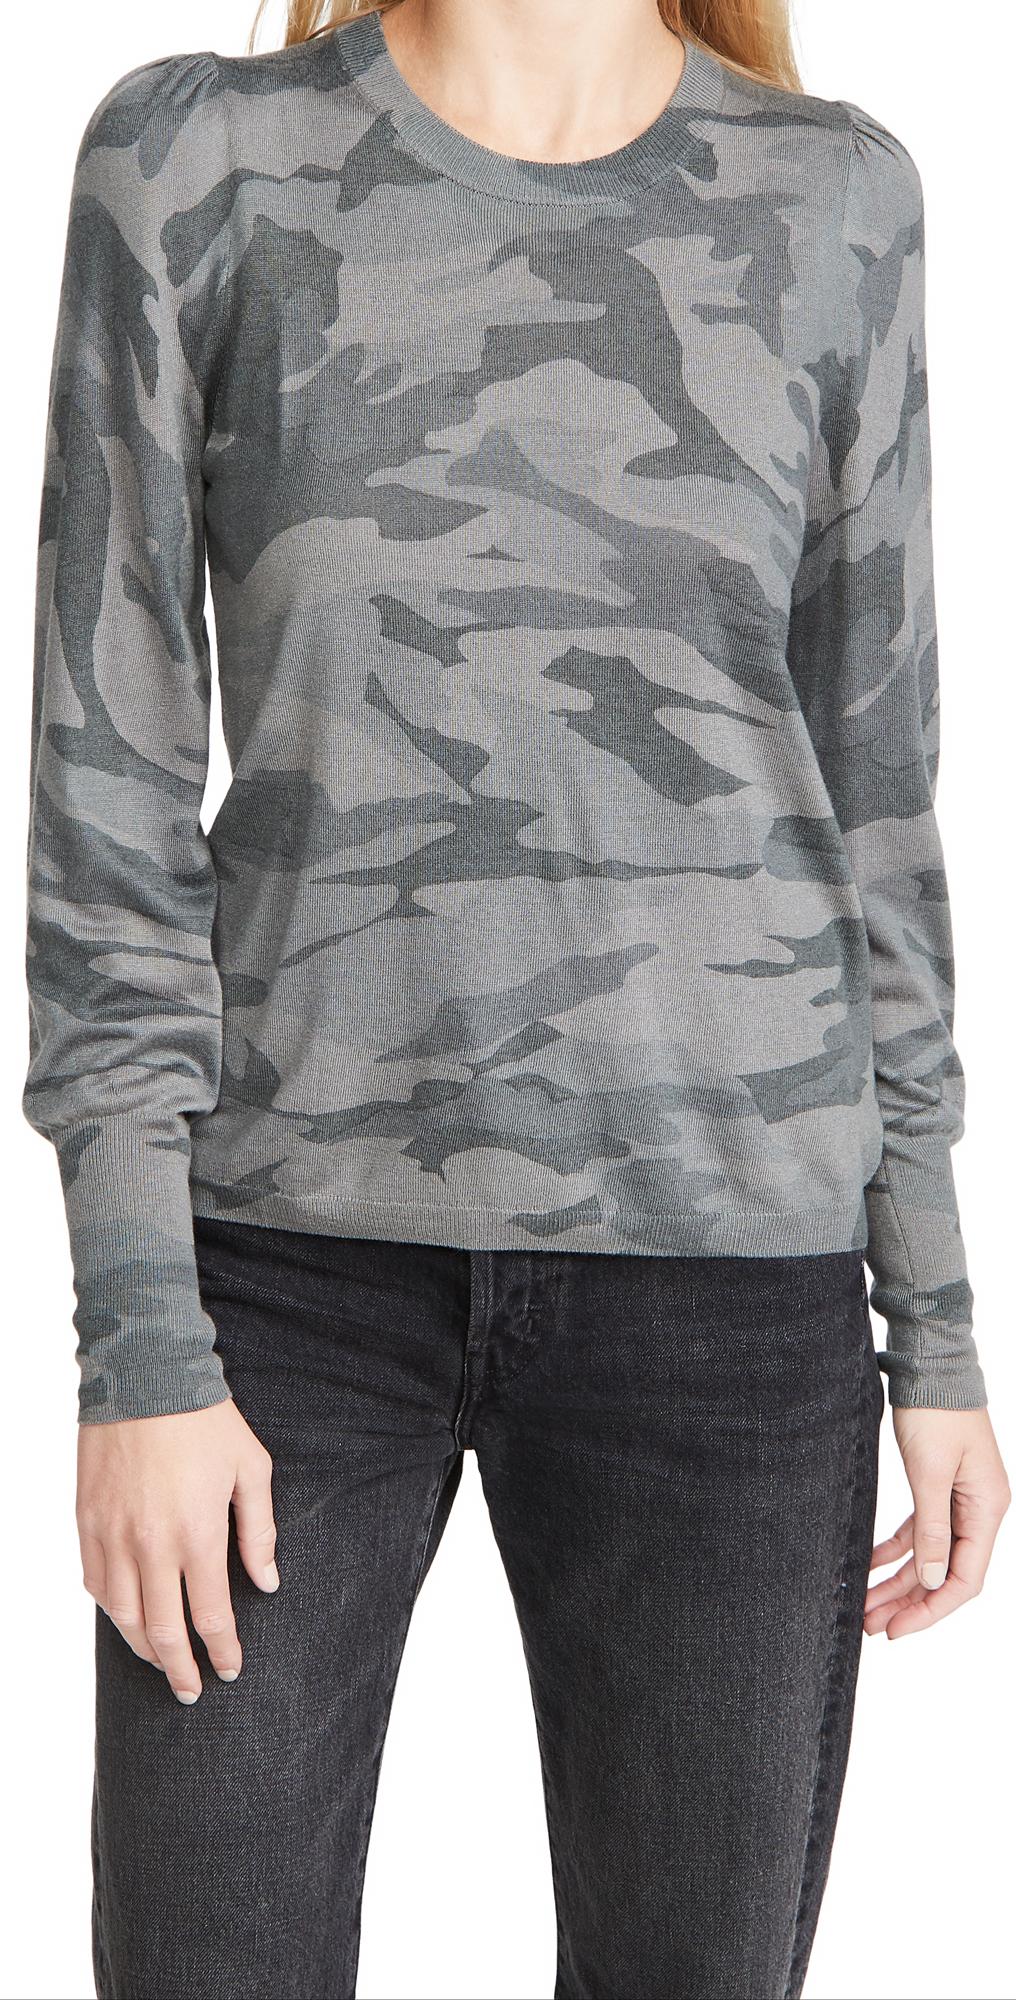 Splendid Camo Puff Sleeve Pullover